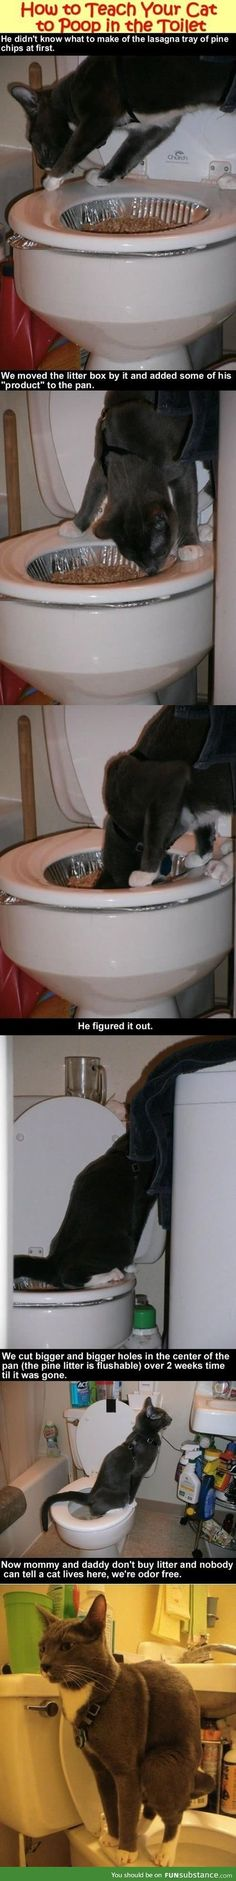 Teach a cat to take a dump in the toilet  #train